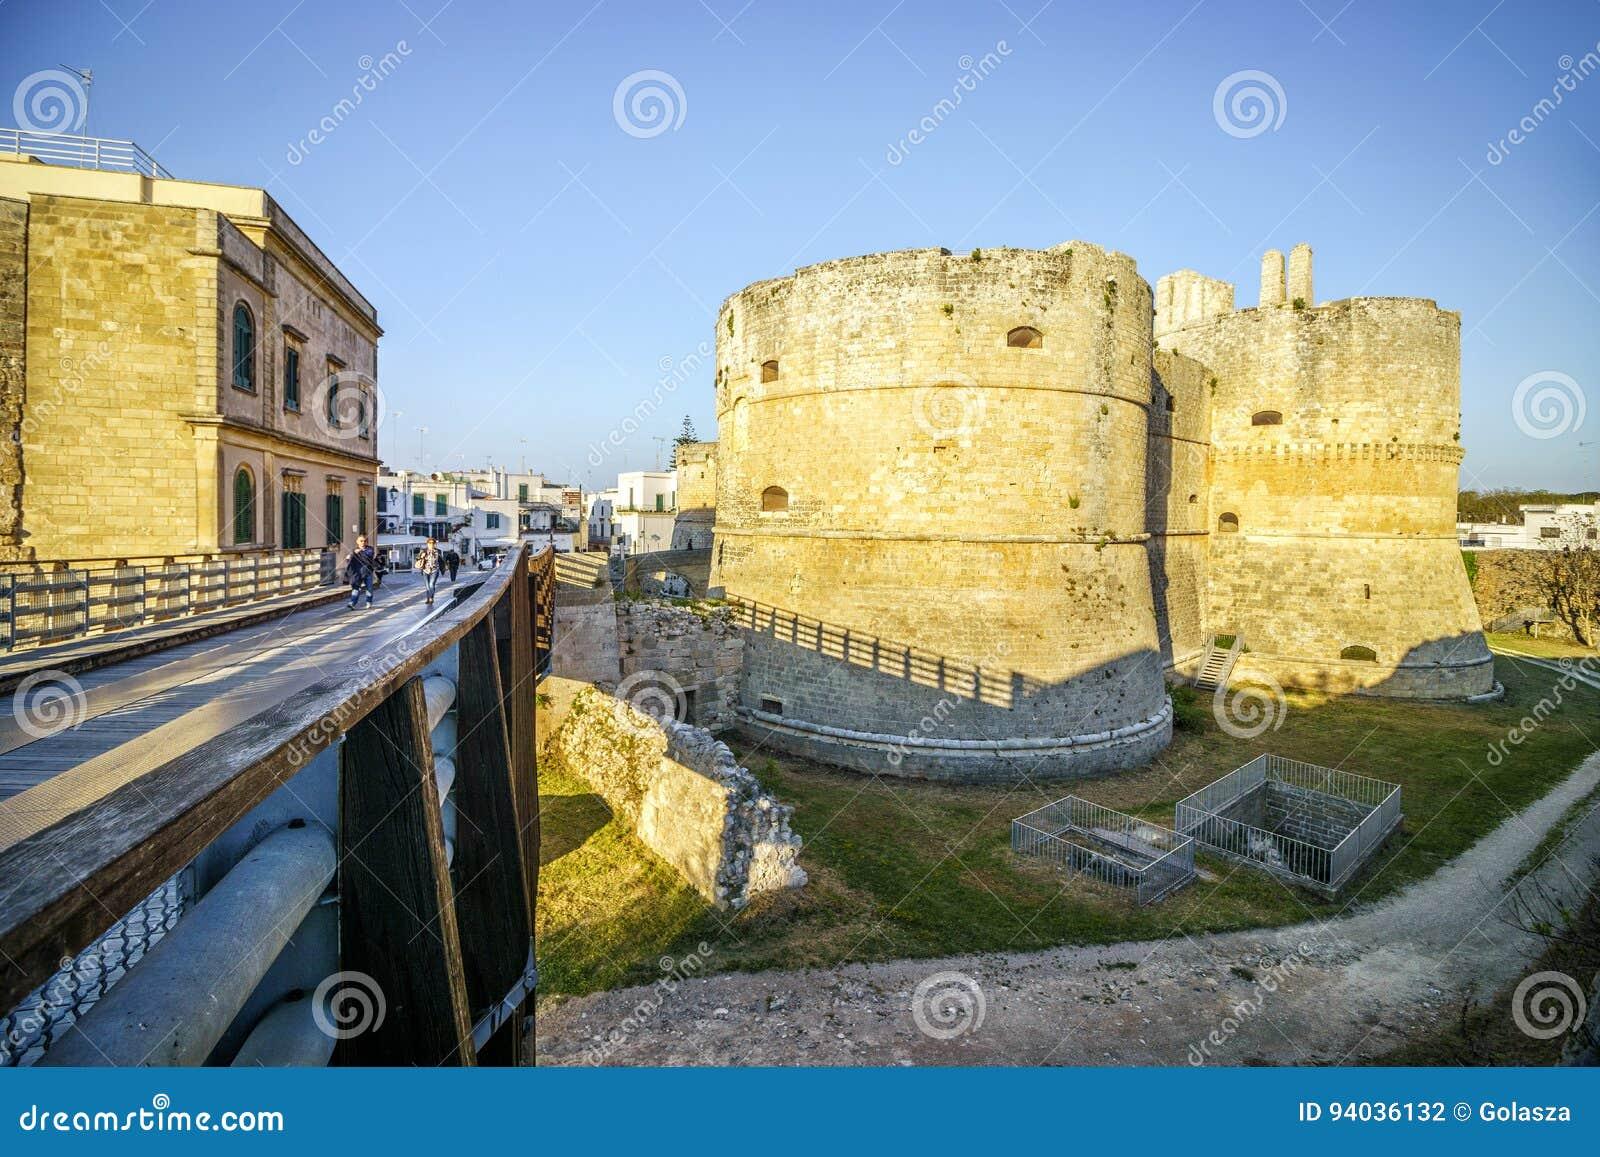 Aragonese城堡在奥特朗托,普利亚,意大利